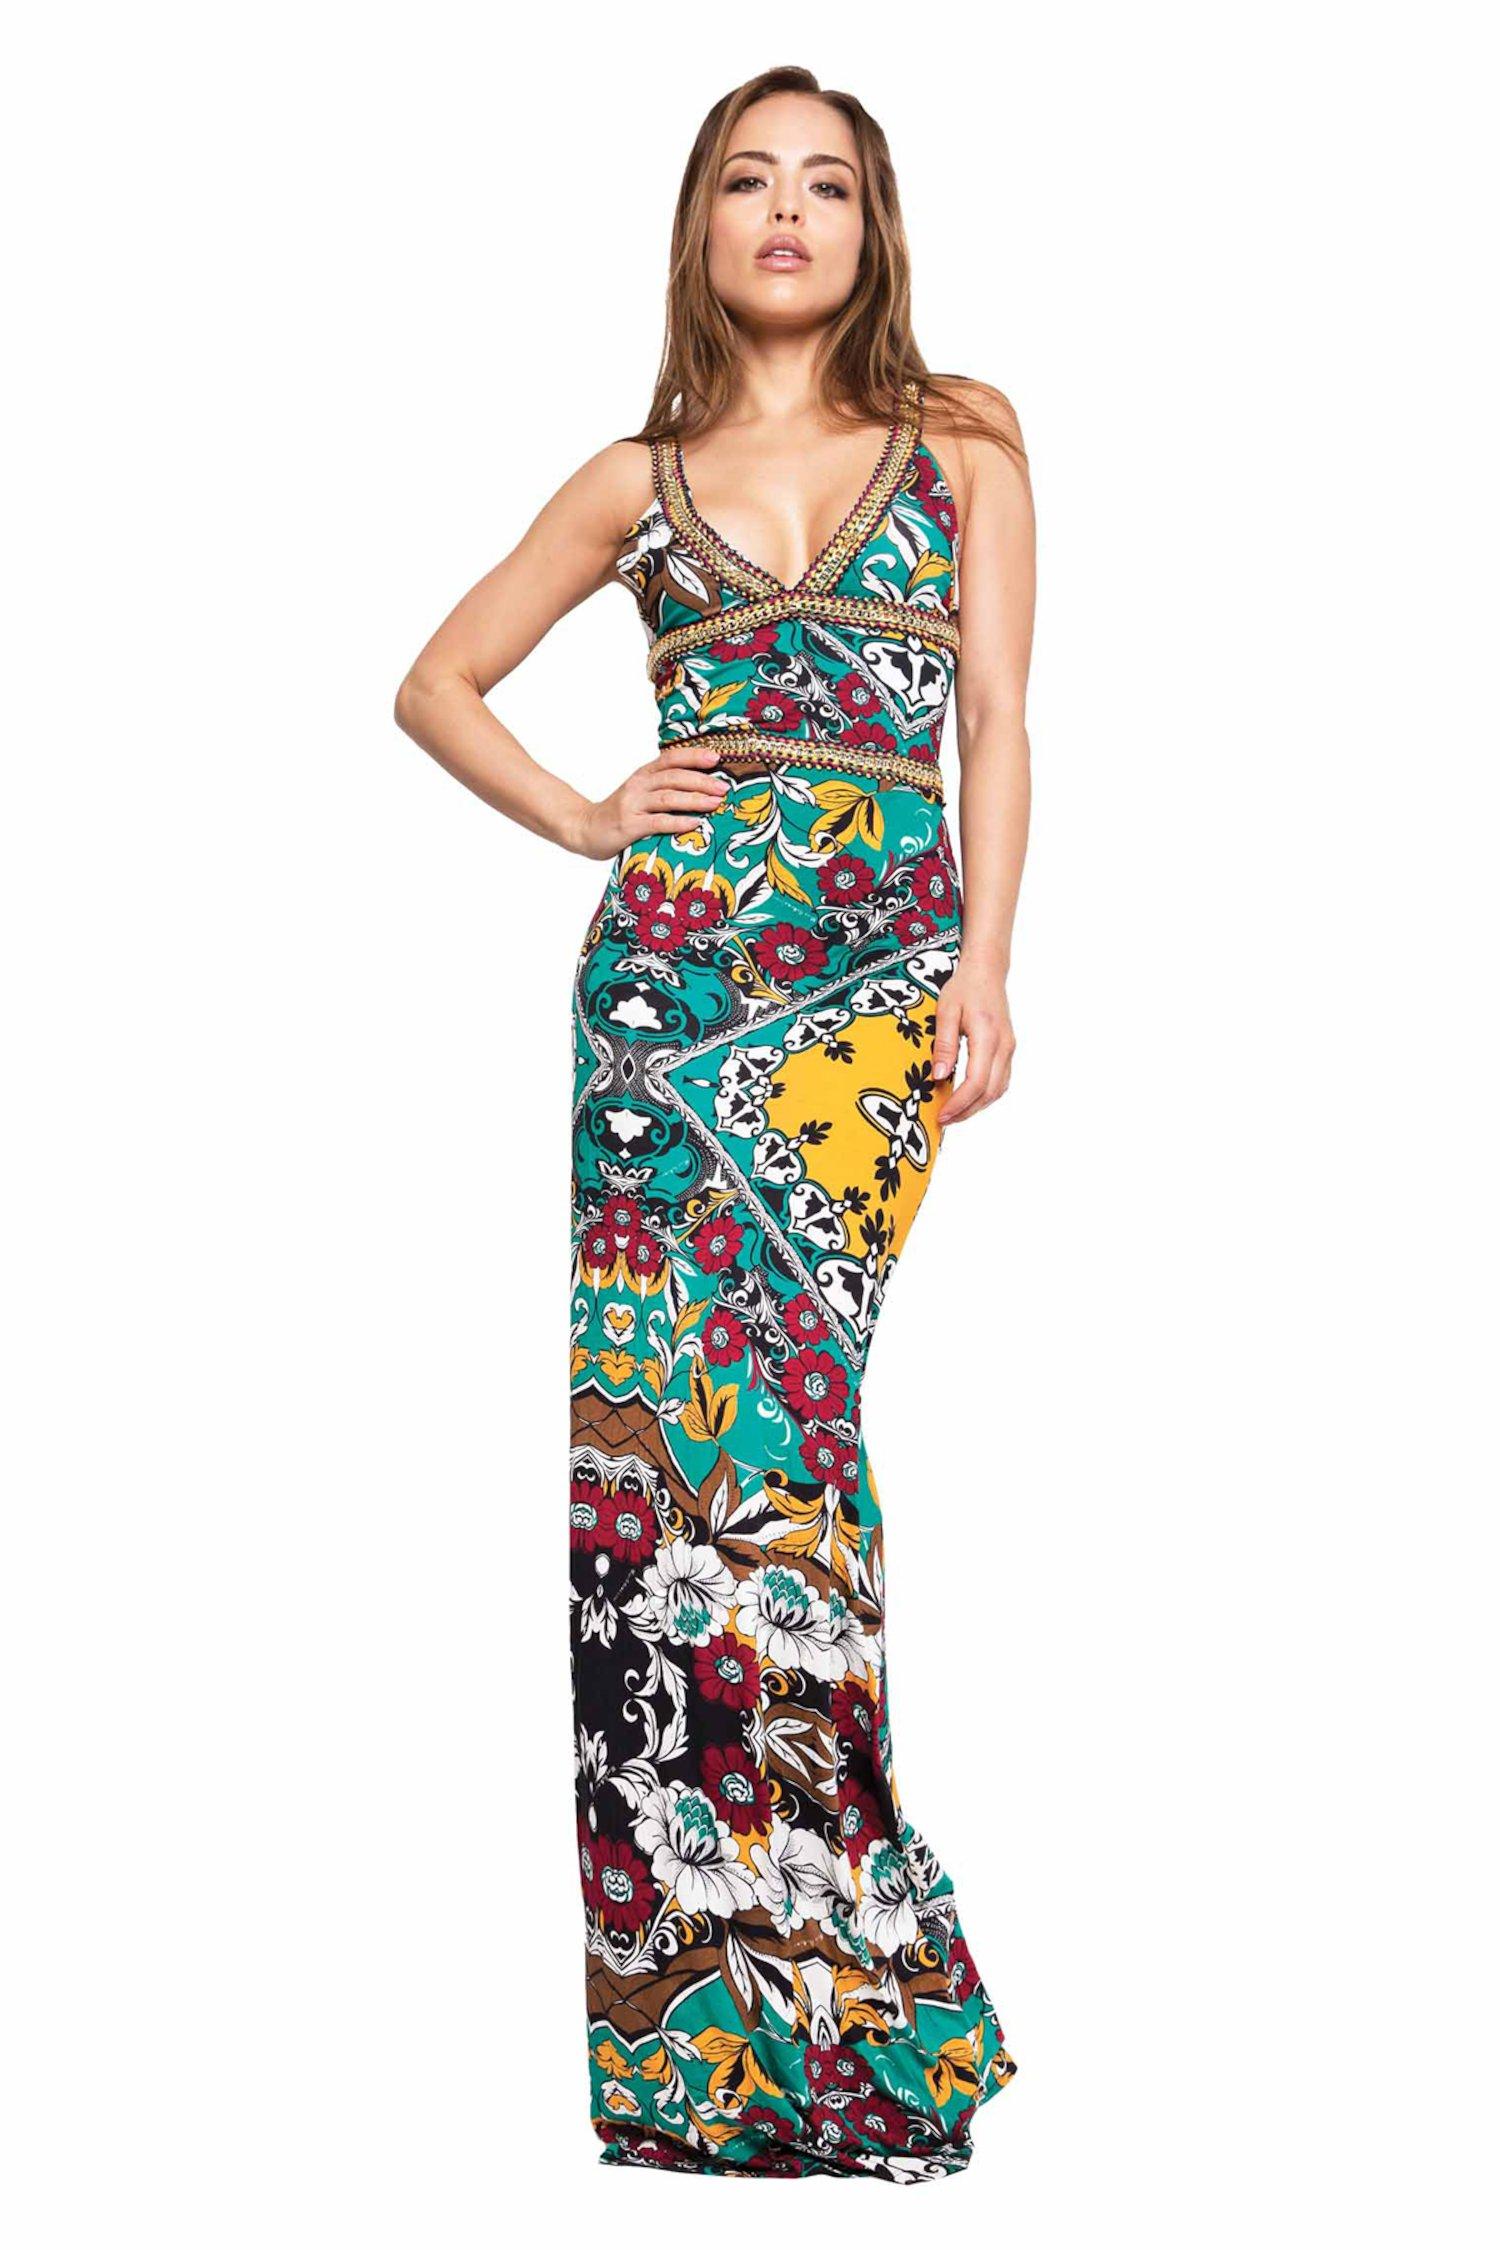 LONG GOLD CHAINS DRESS - Bandana Verde